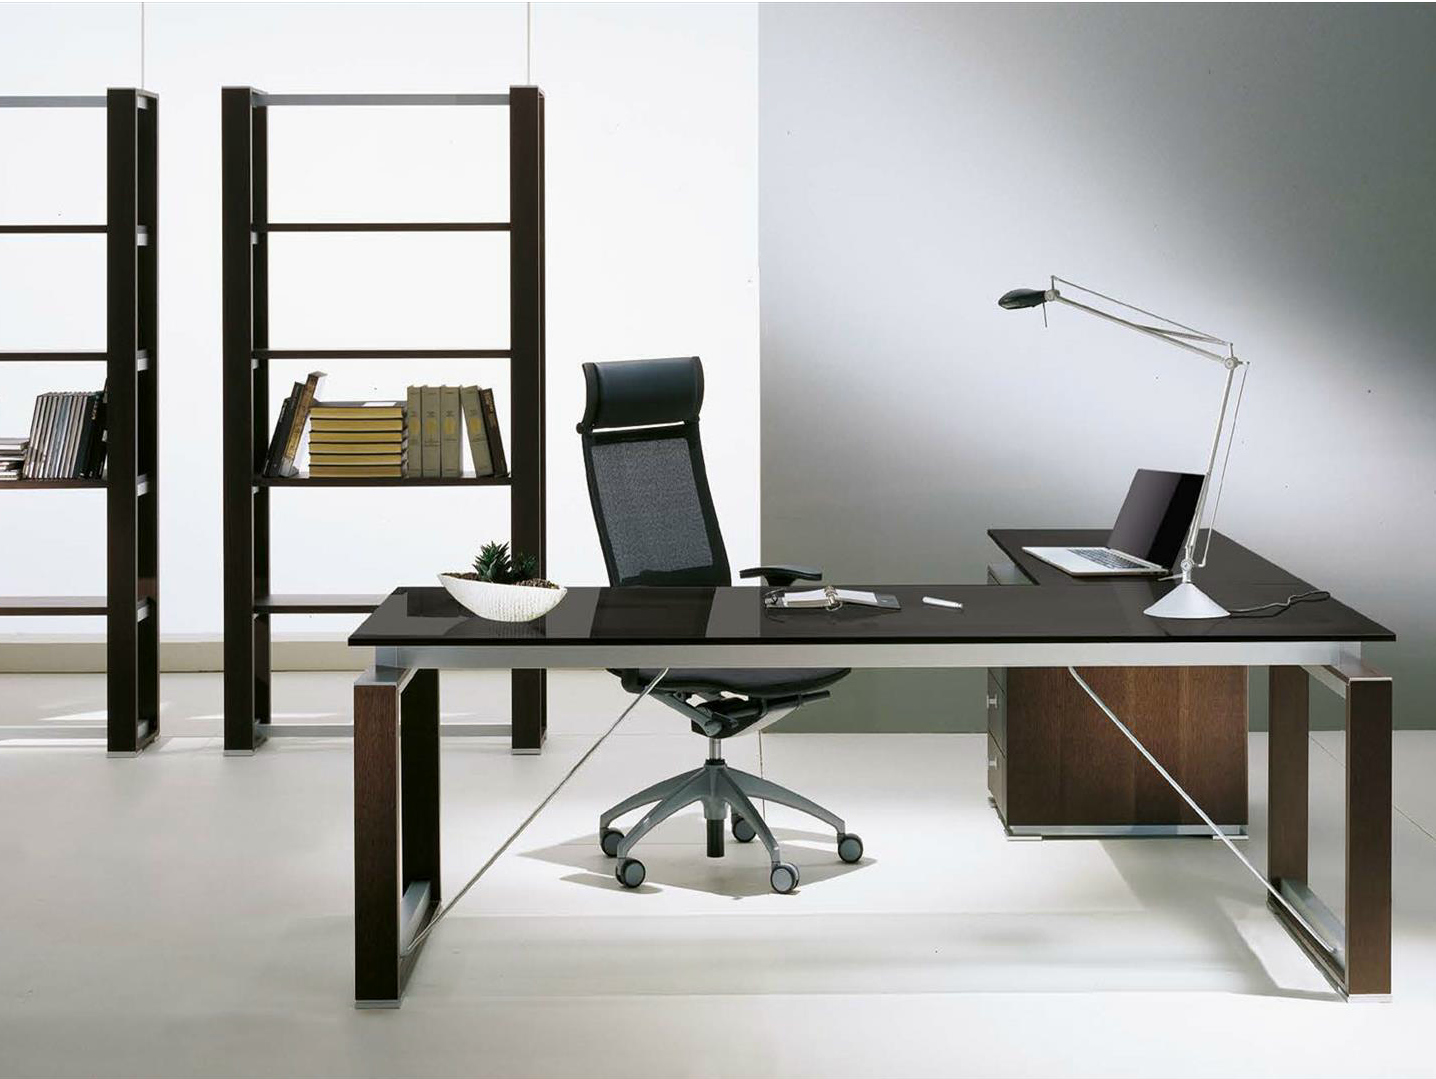 Electa scrivania ad angolo by ift design nikolas chachamis